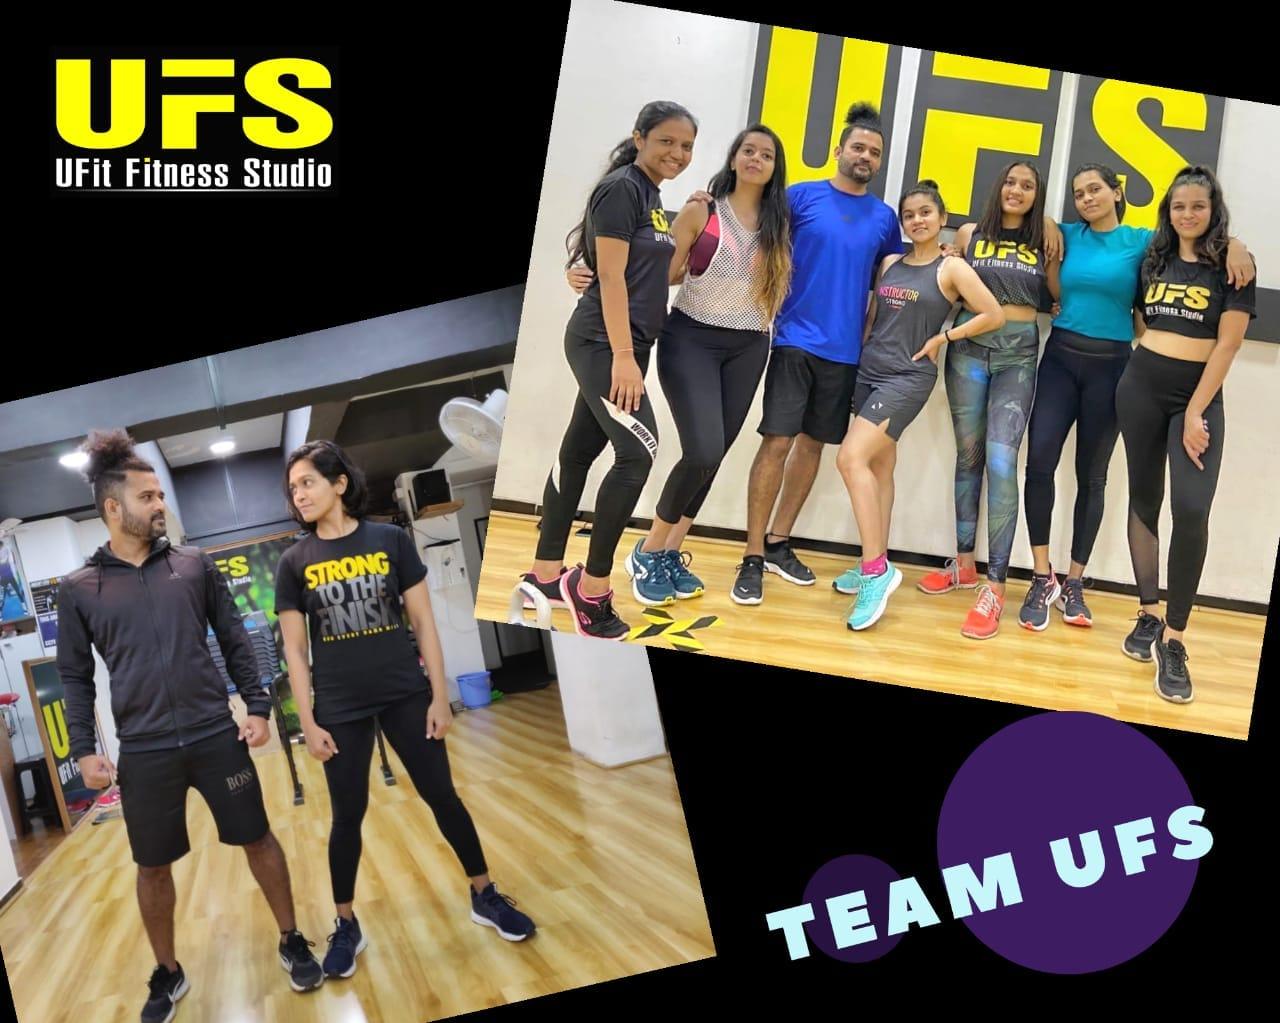 Ufs - Ufit Fitness Studio (ladies Only) Vashi